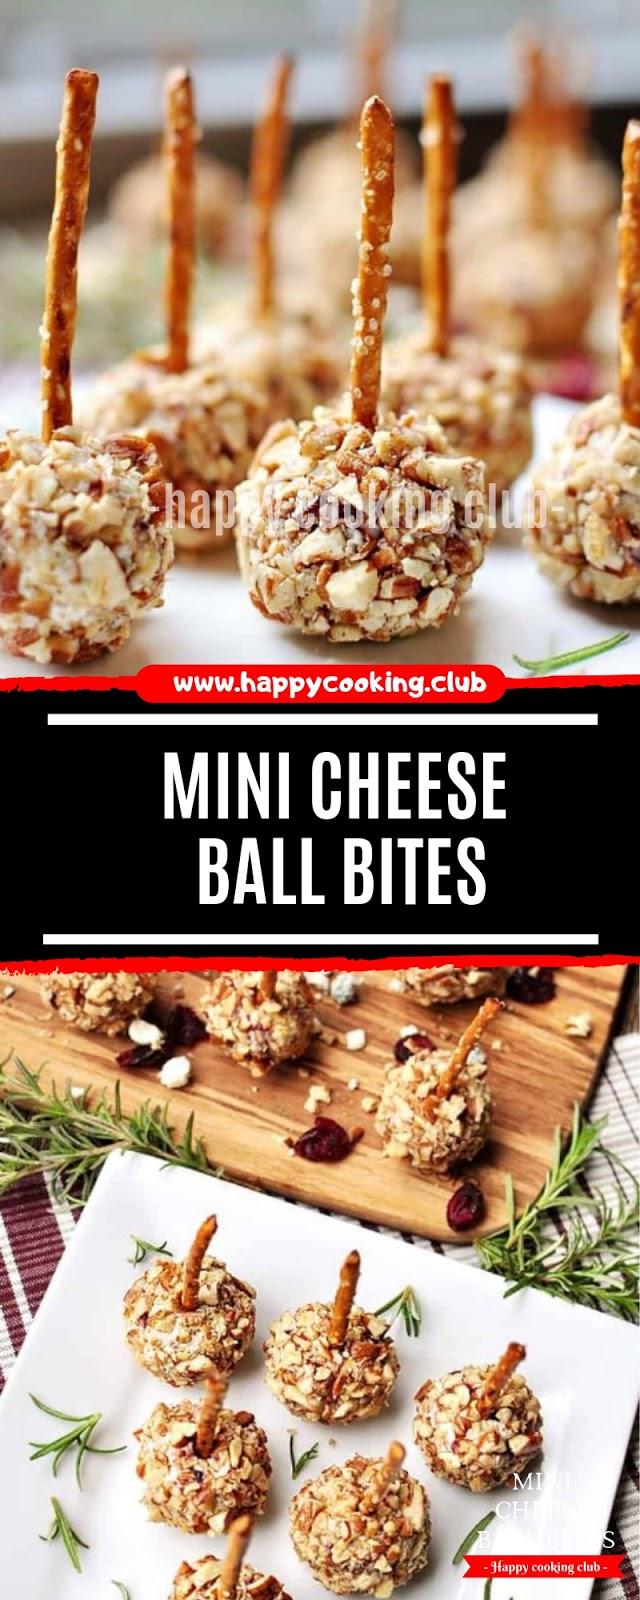 Mini Cheese Ball Bites Recipe